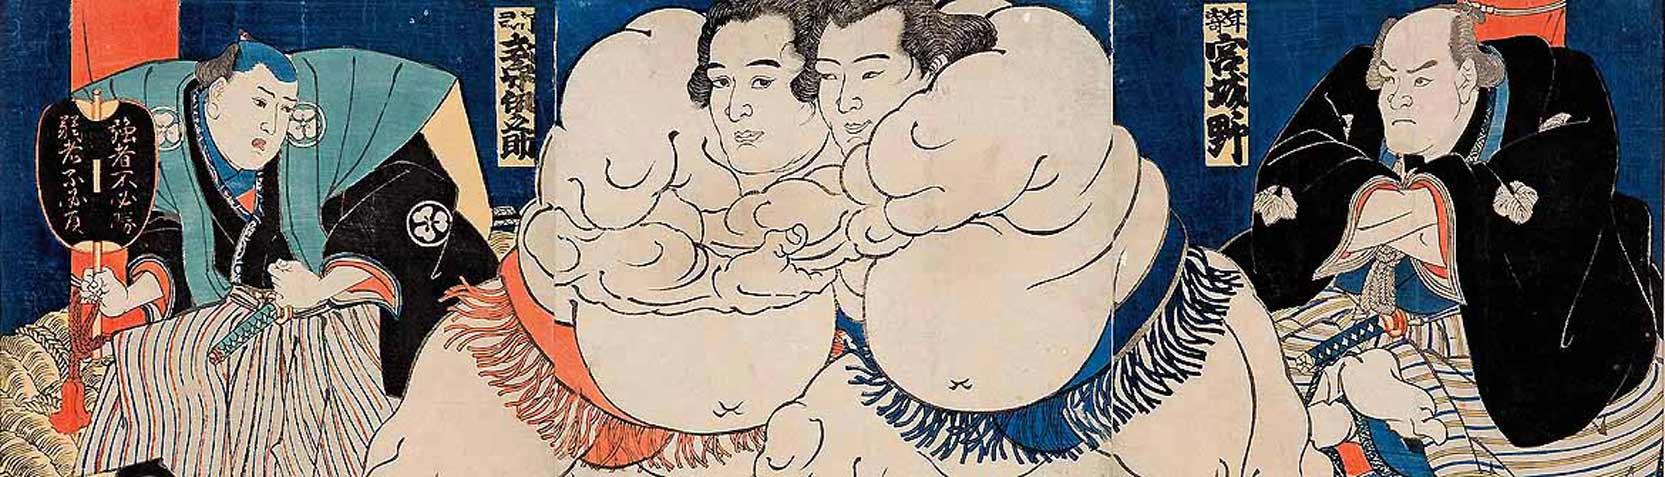 Artisti A-Z - Utagawa Kuniyoshi